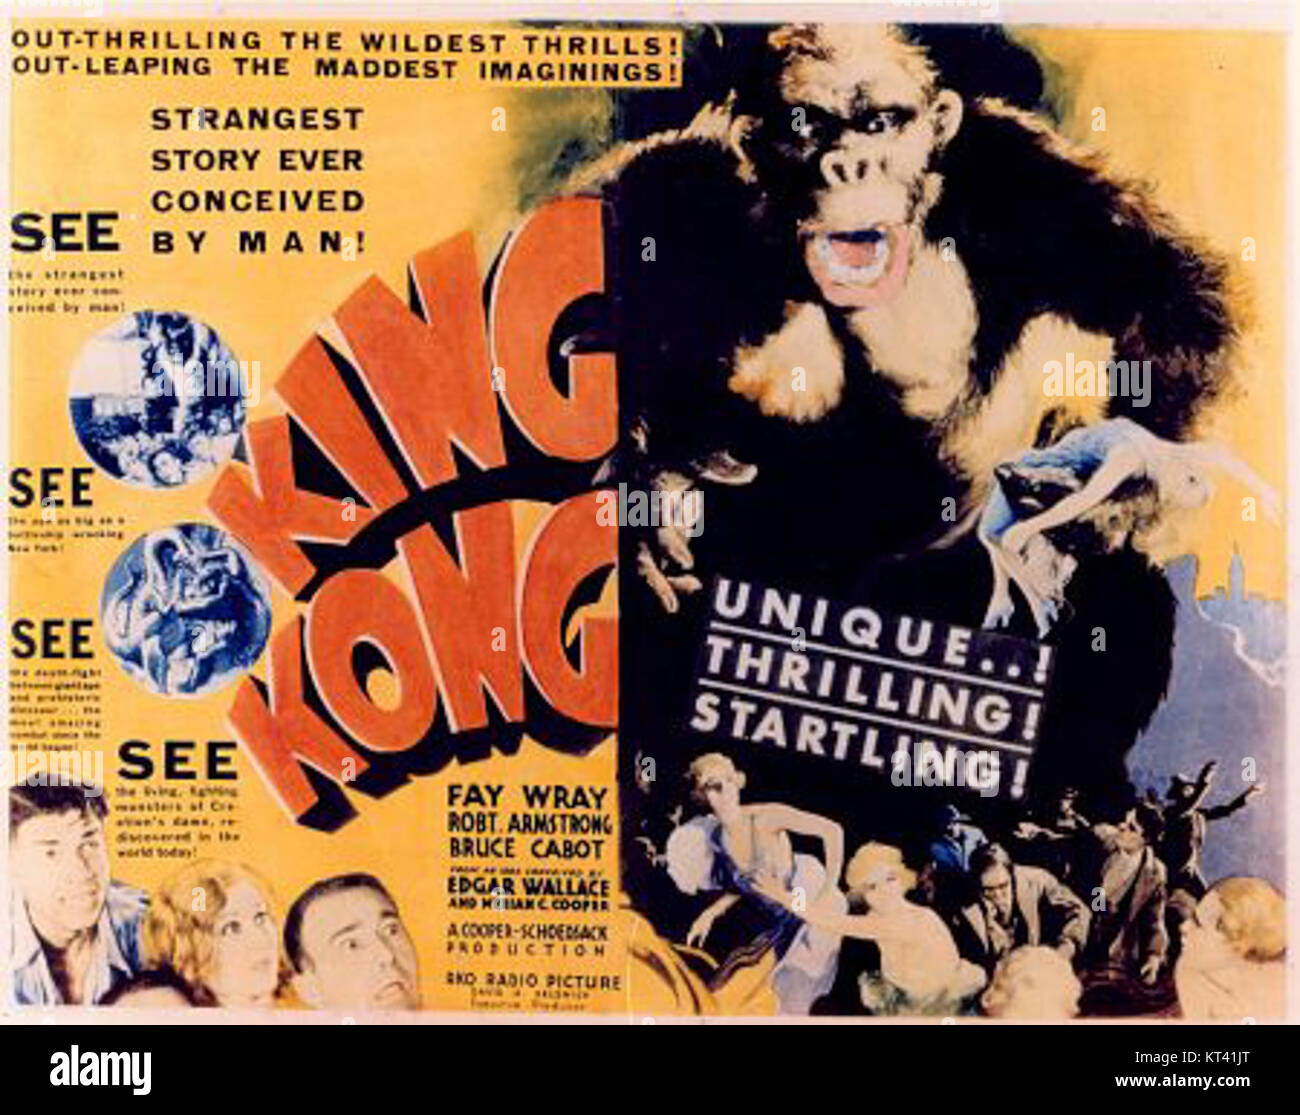 King Kong 1933 Movie Poster 2 Stock Photo 169734176 Alamy